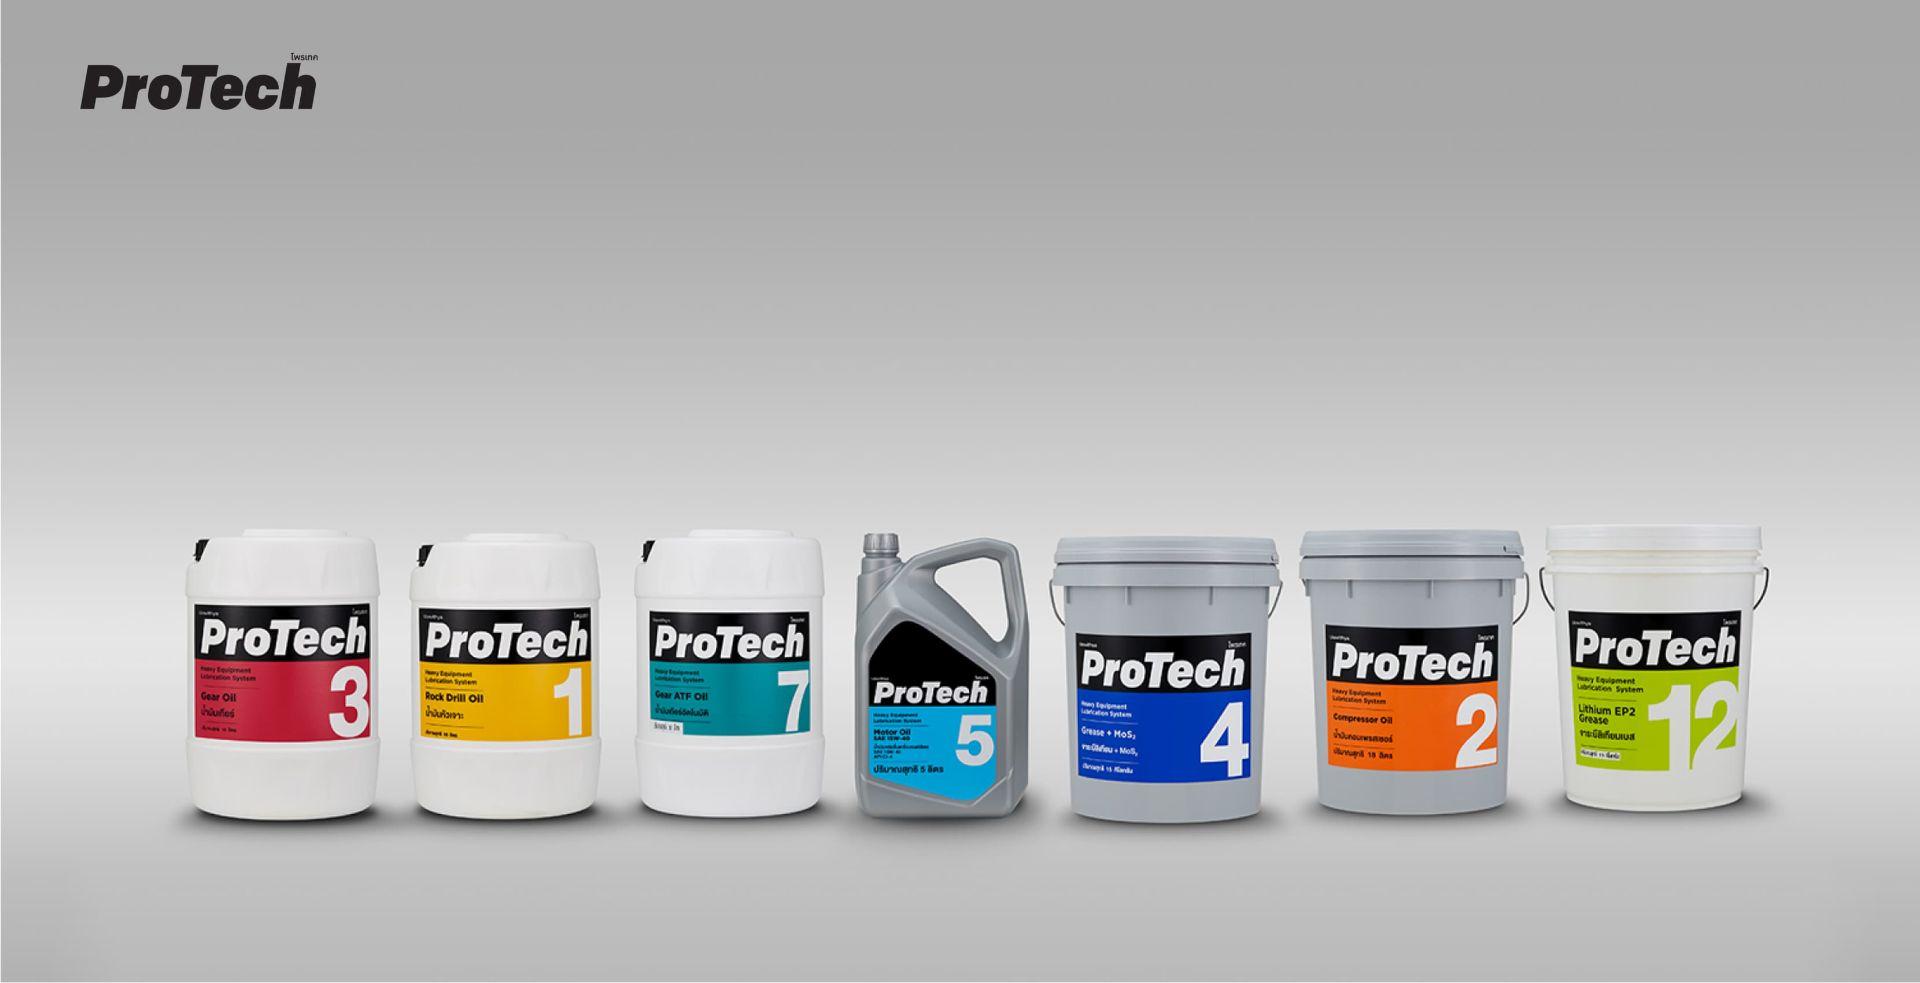 Protech-Top.jpg